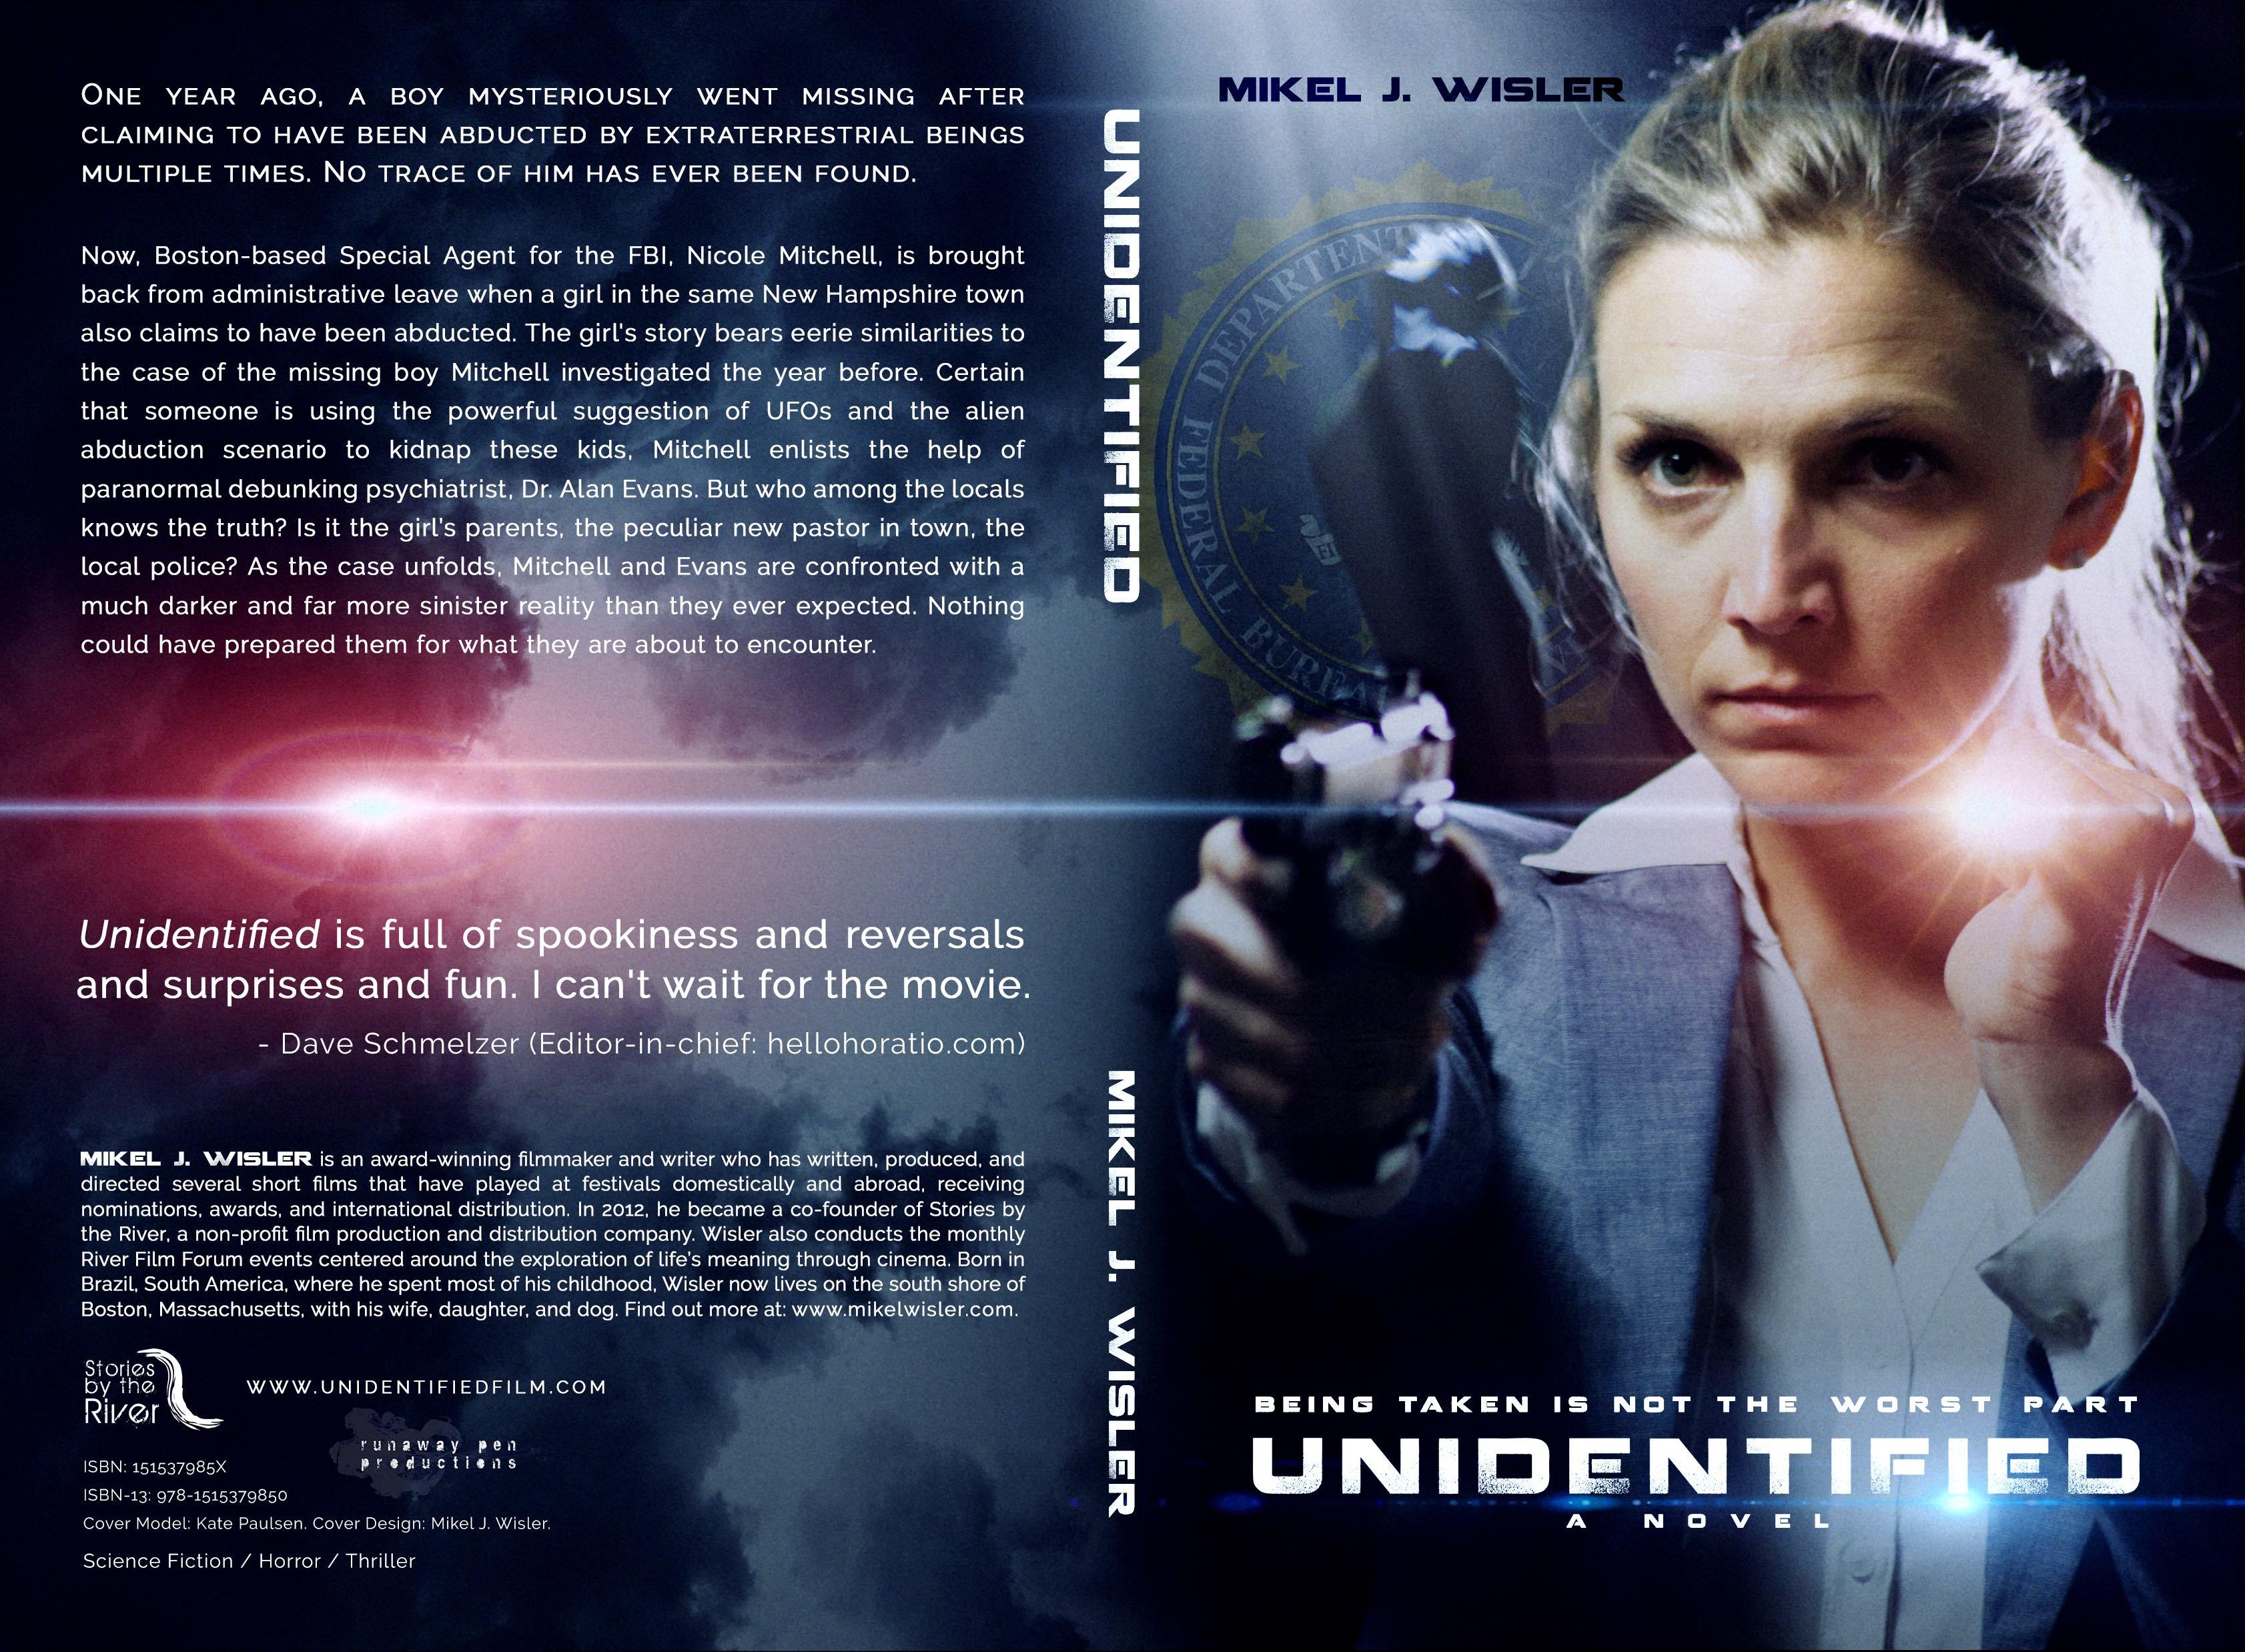 Unidentified Novel